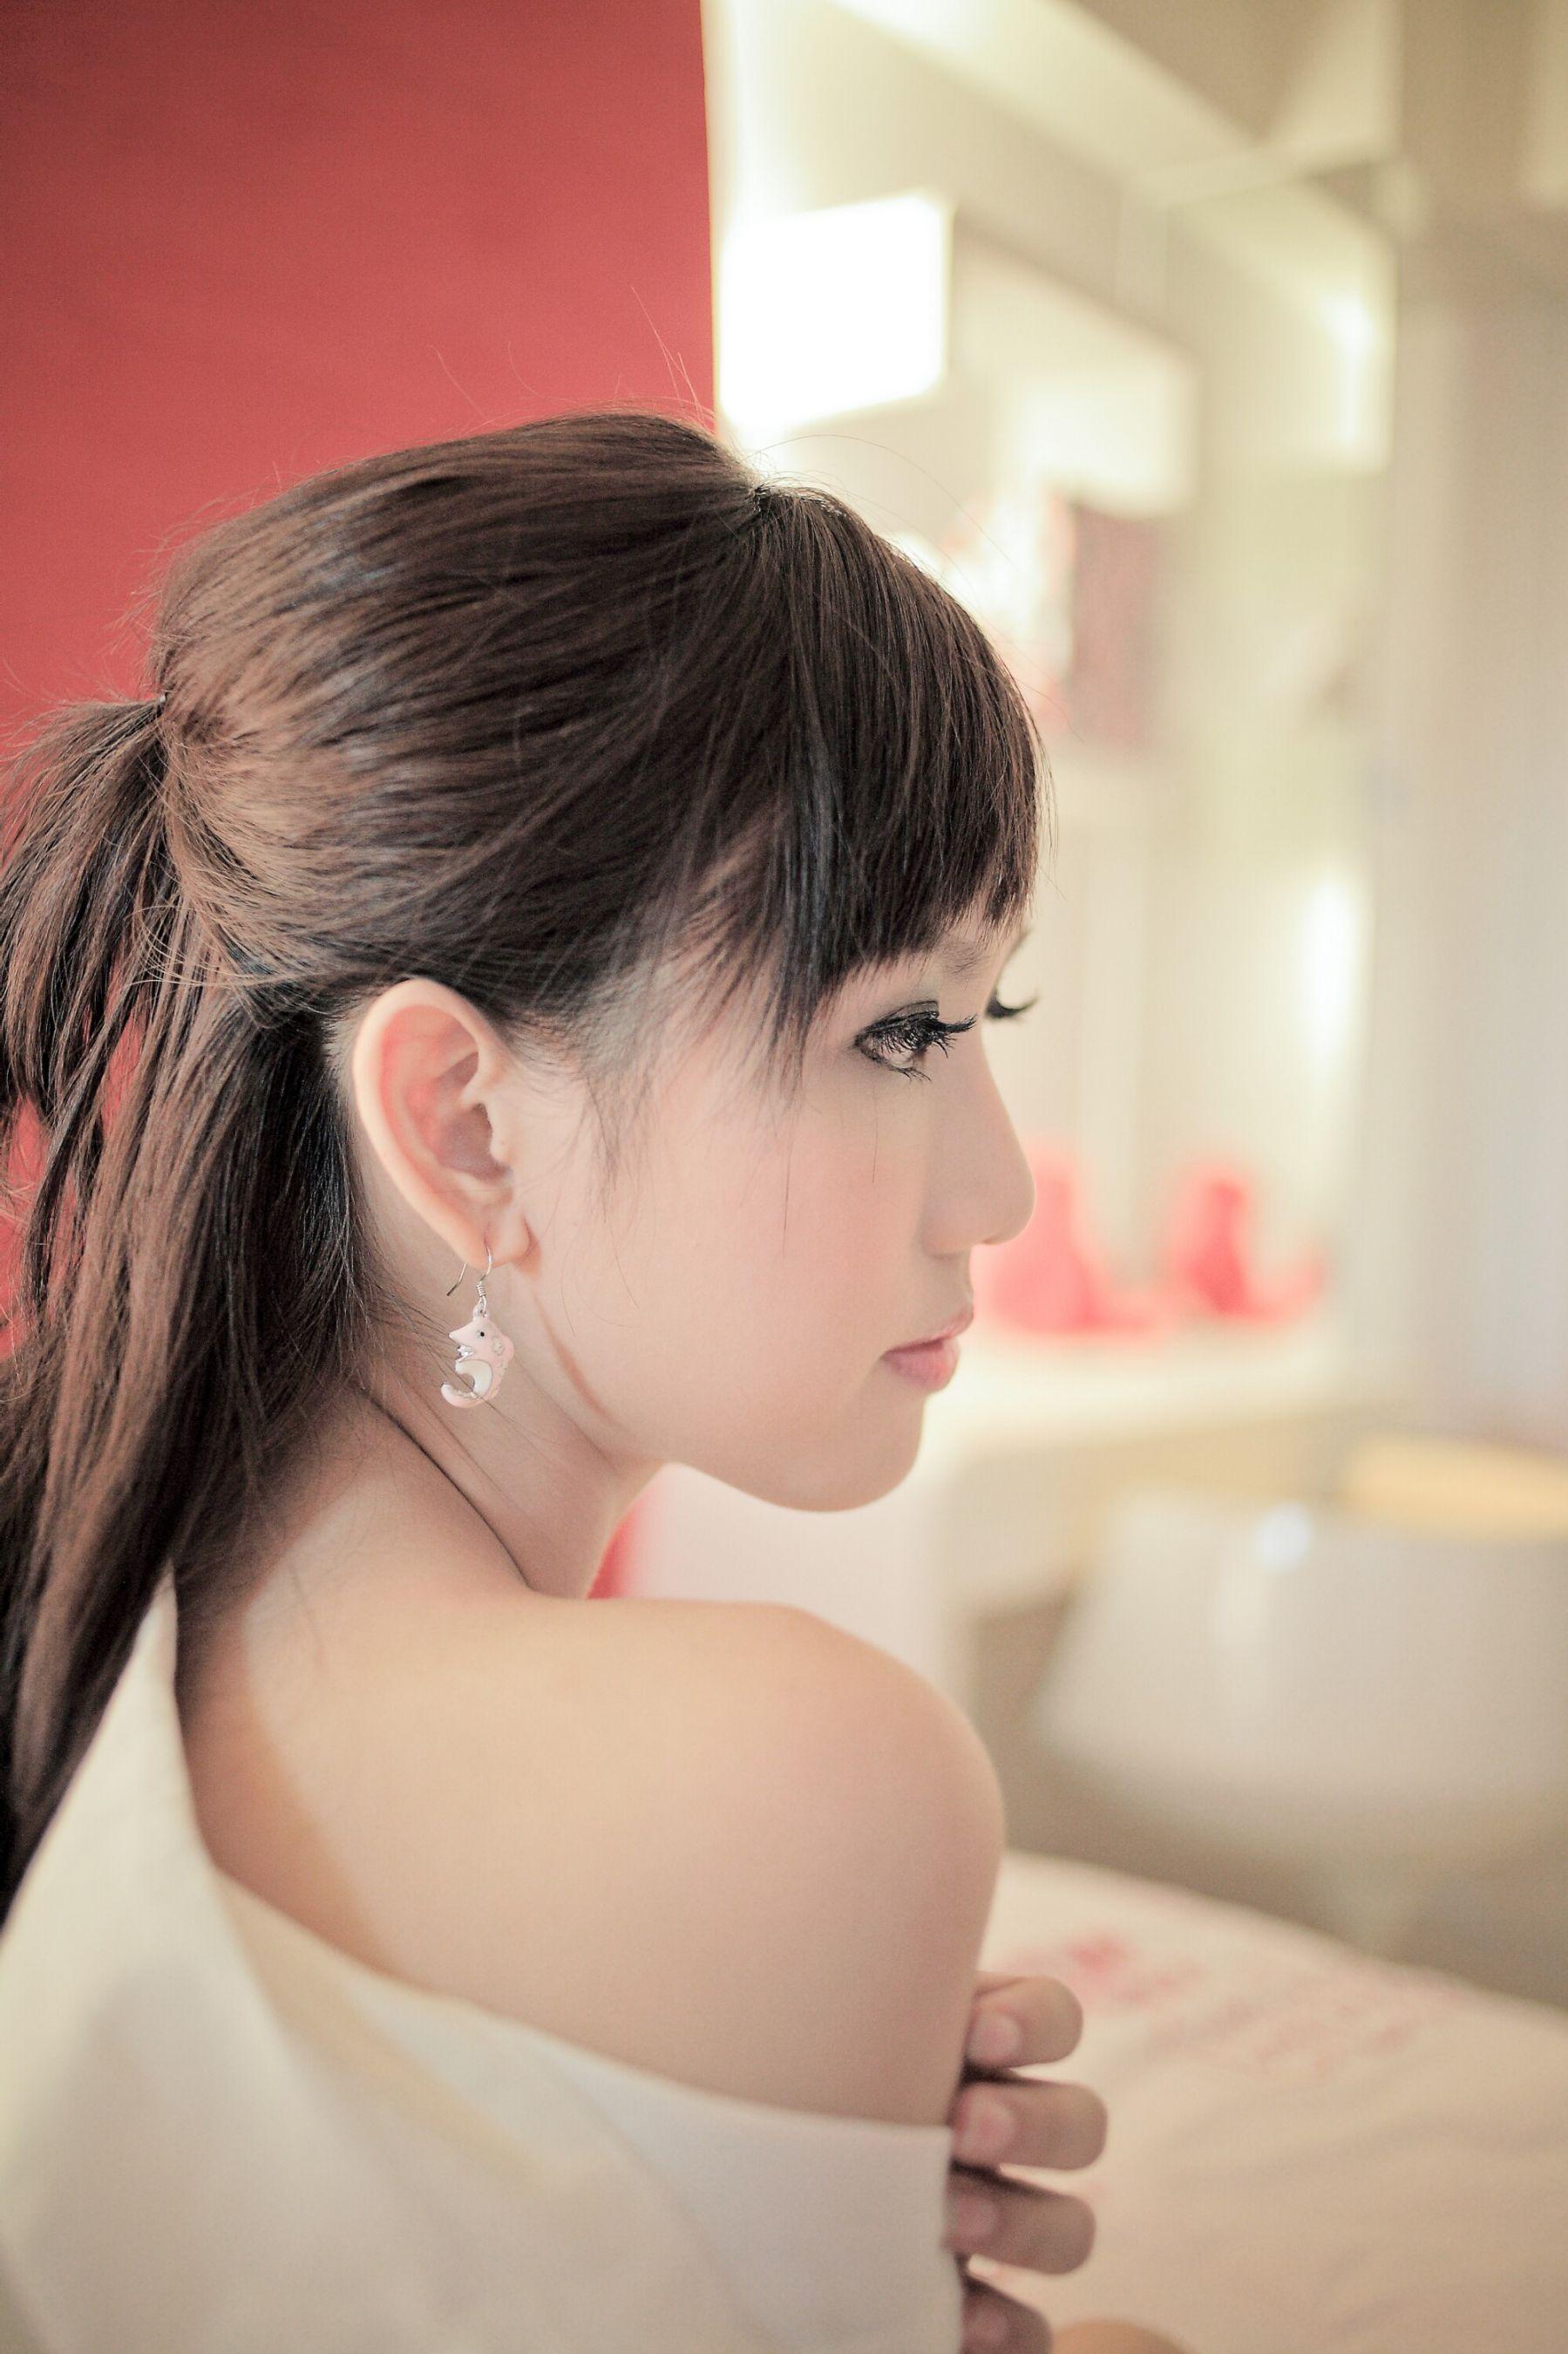 VOL.1247 [台湾正妹]气质清新:林瑞瑜(Beautyleg Sara,腿模Sara)高品质写真套图(17P)